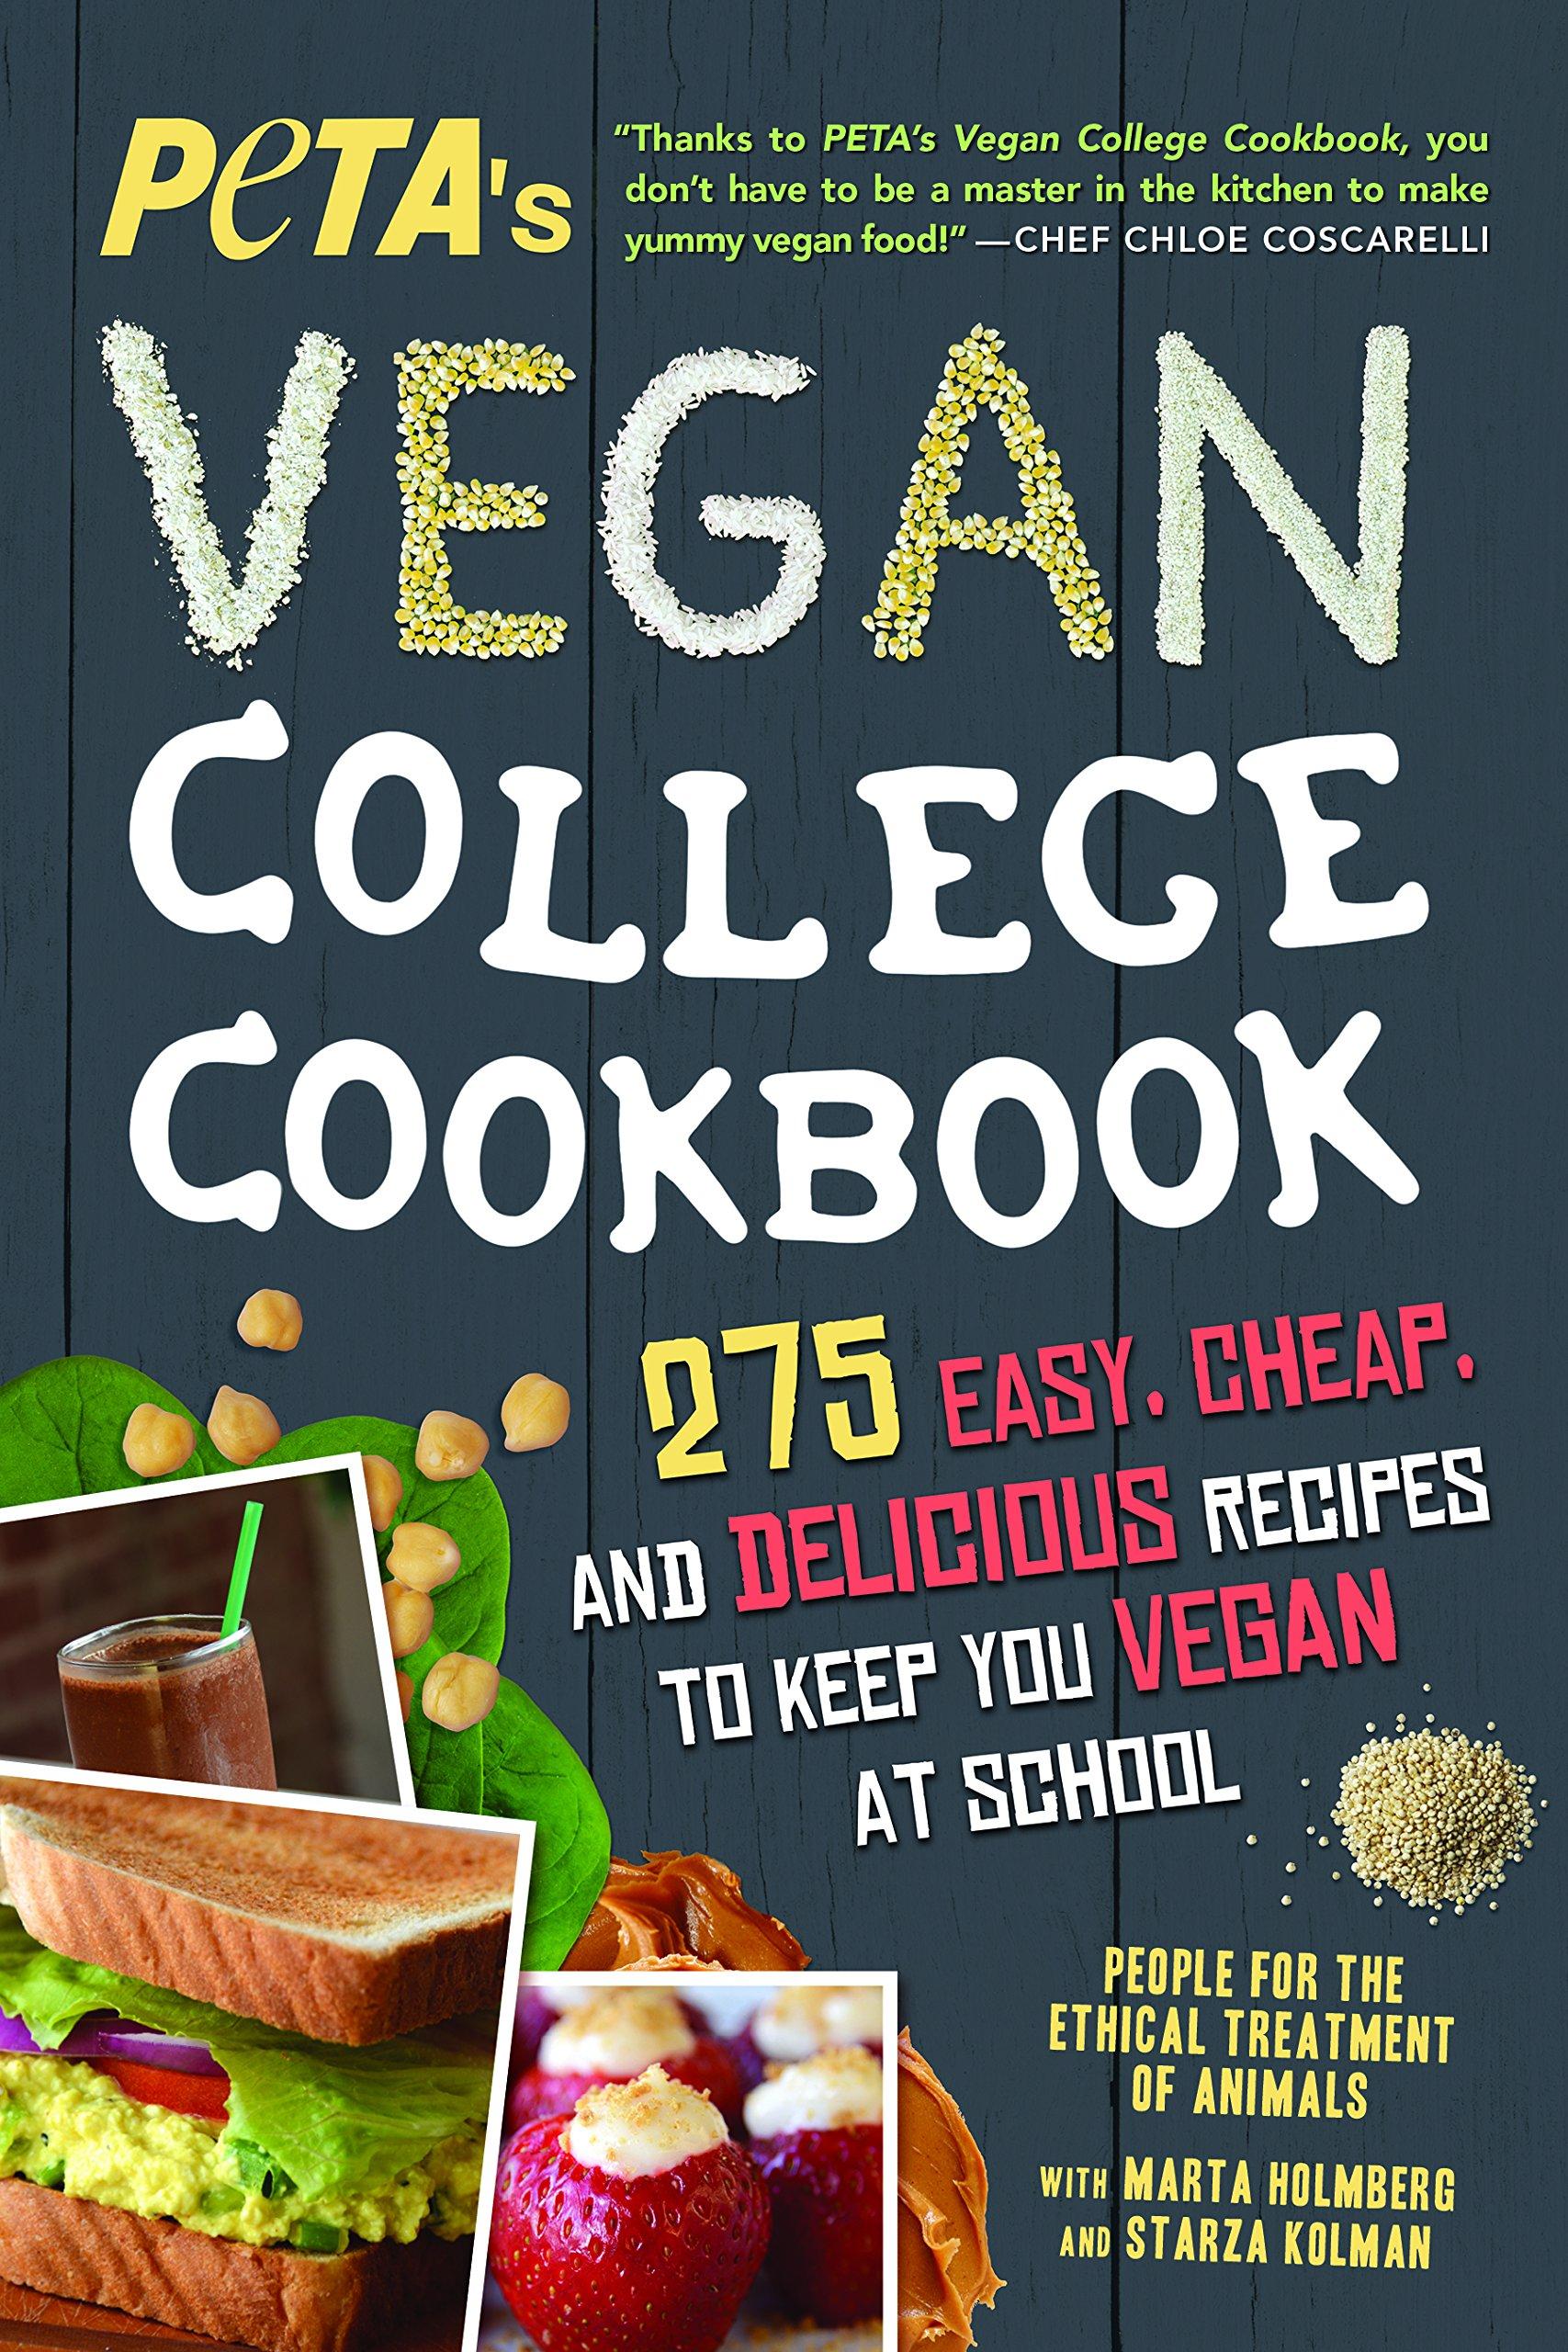 ad89de4d0e9 Peta s Vegan College Cookbook  275 Easy